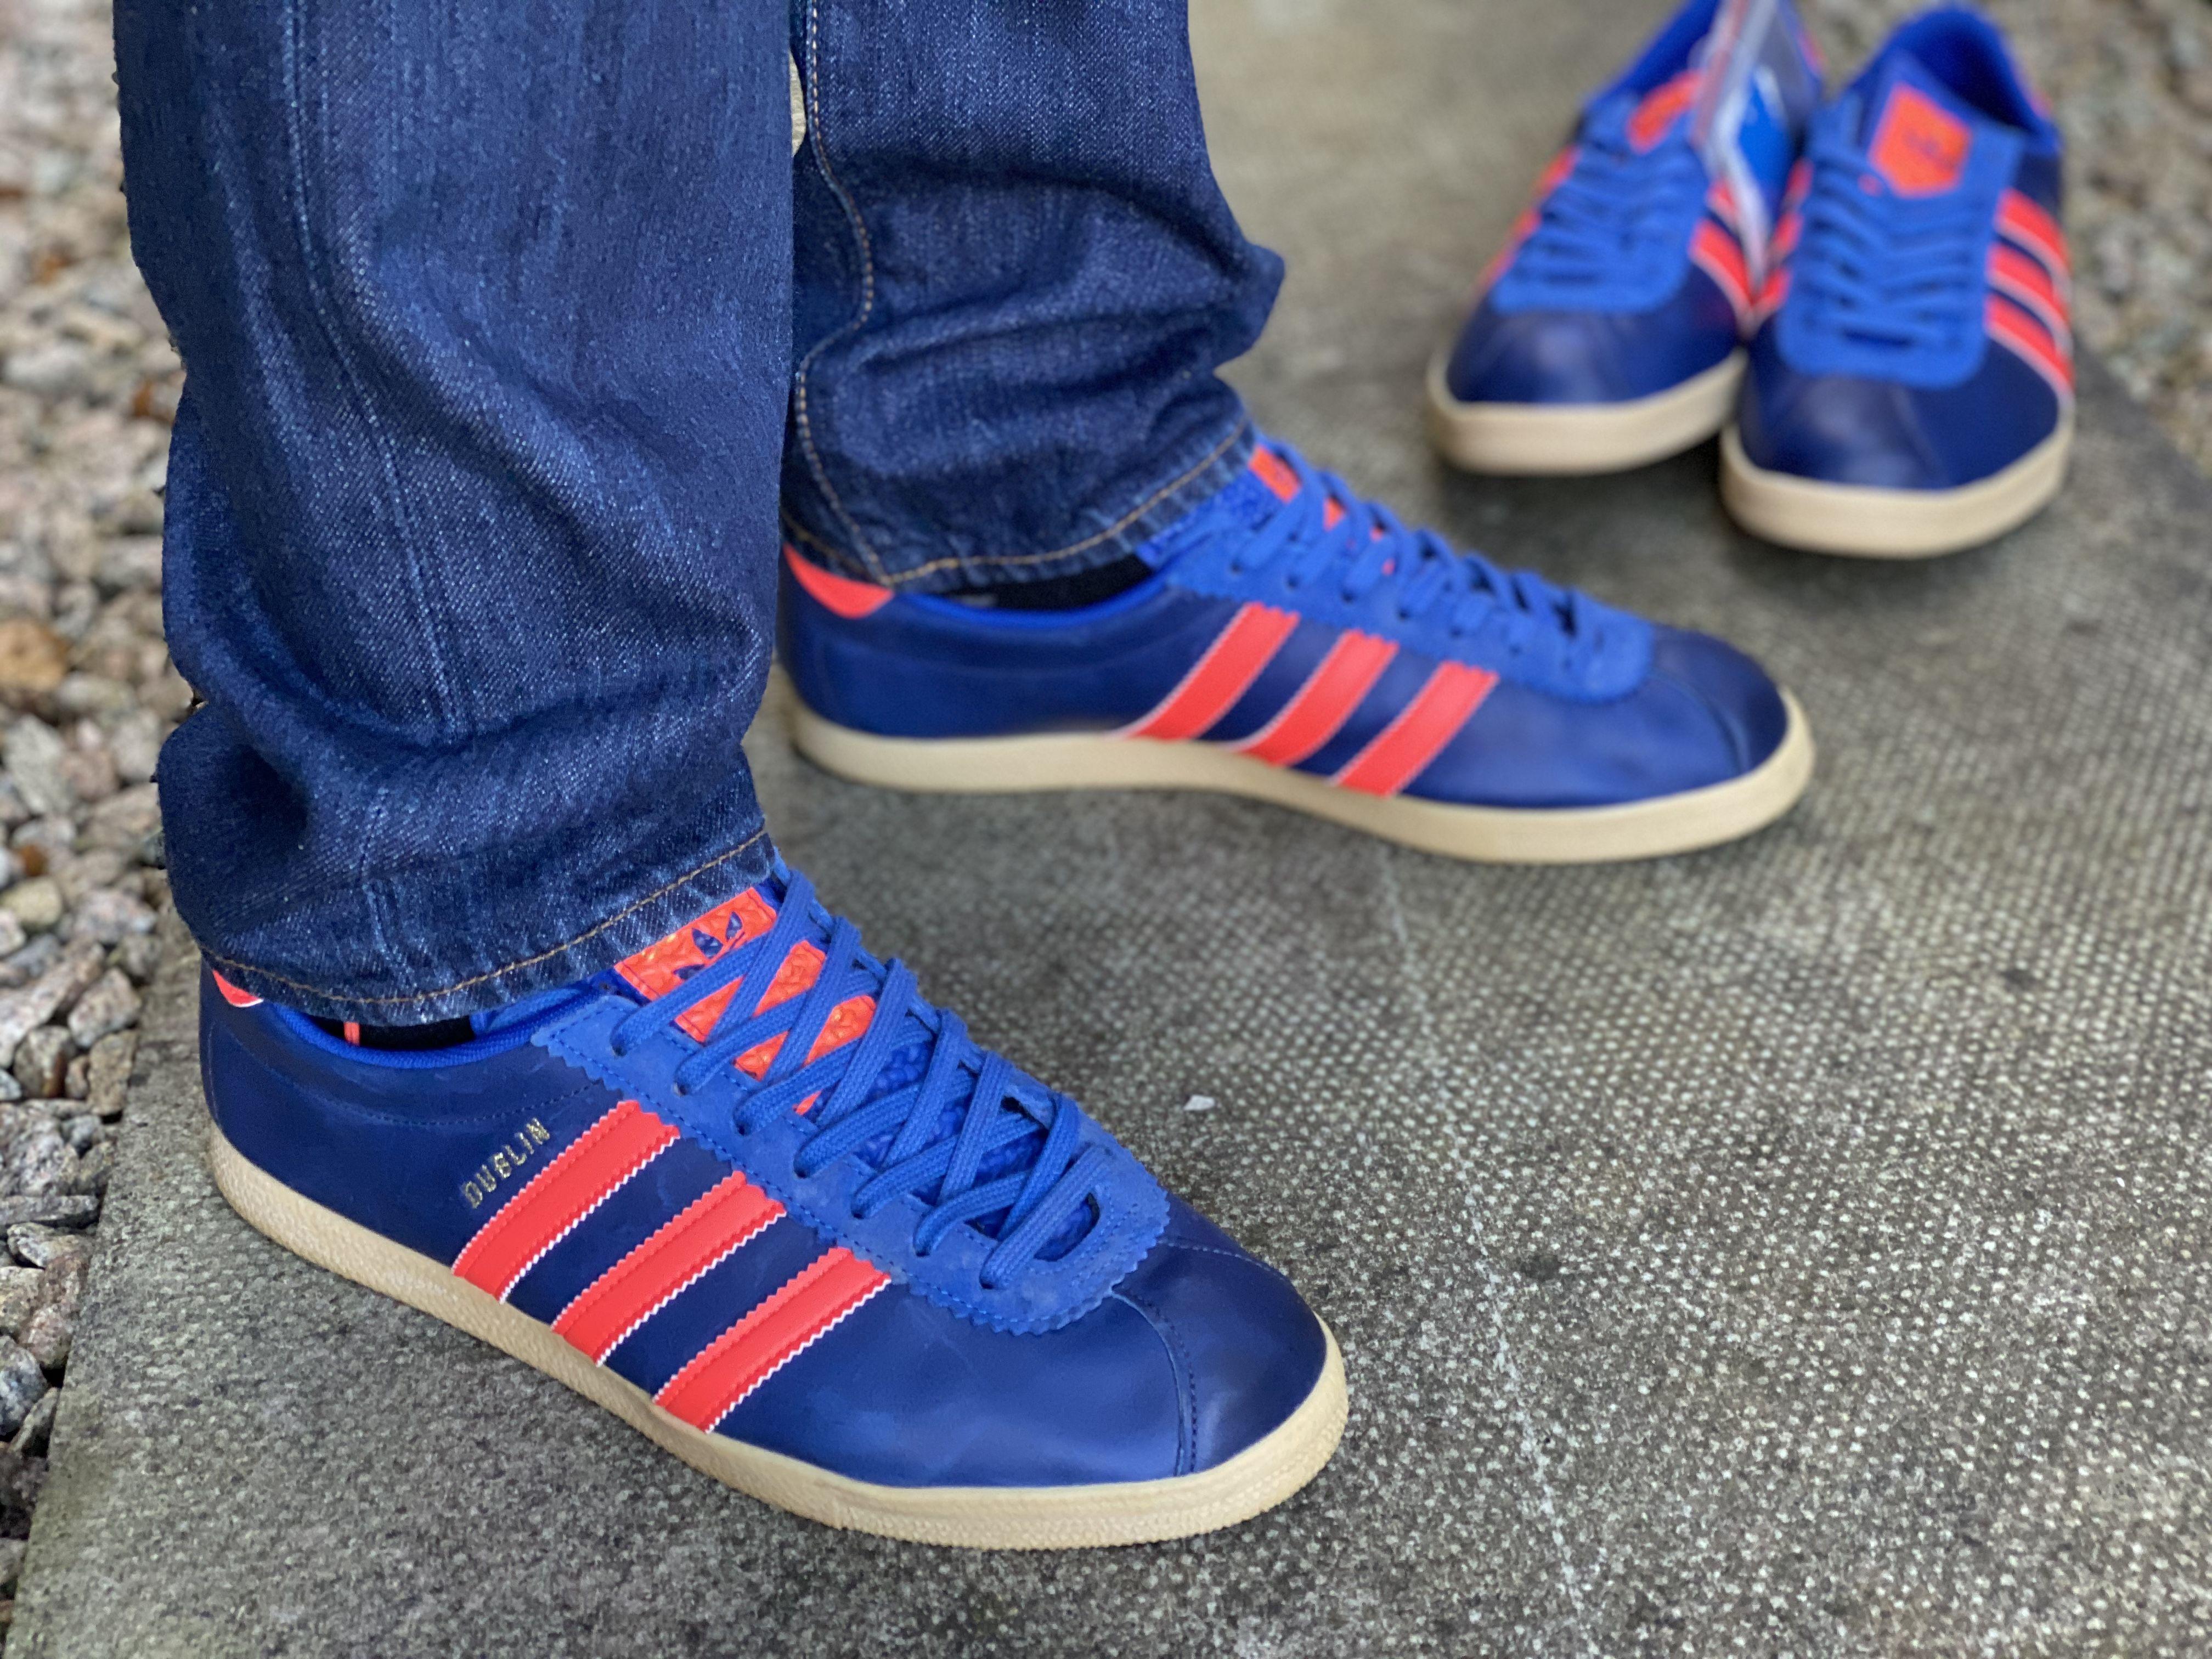 Flojamente raro negativo  Adidas Dublin, 1 of 500 | Adidas, Adidas gazelle sneaker, Adidas trainers